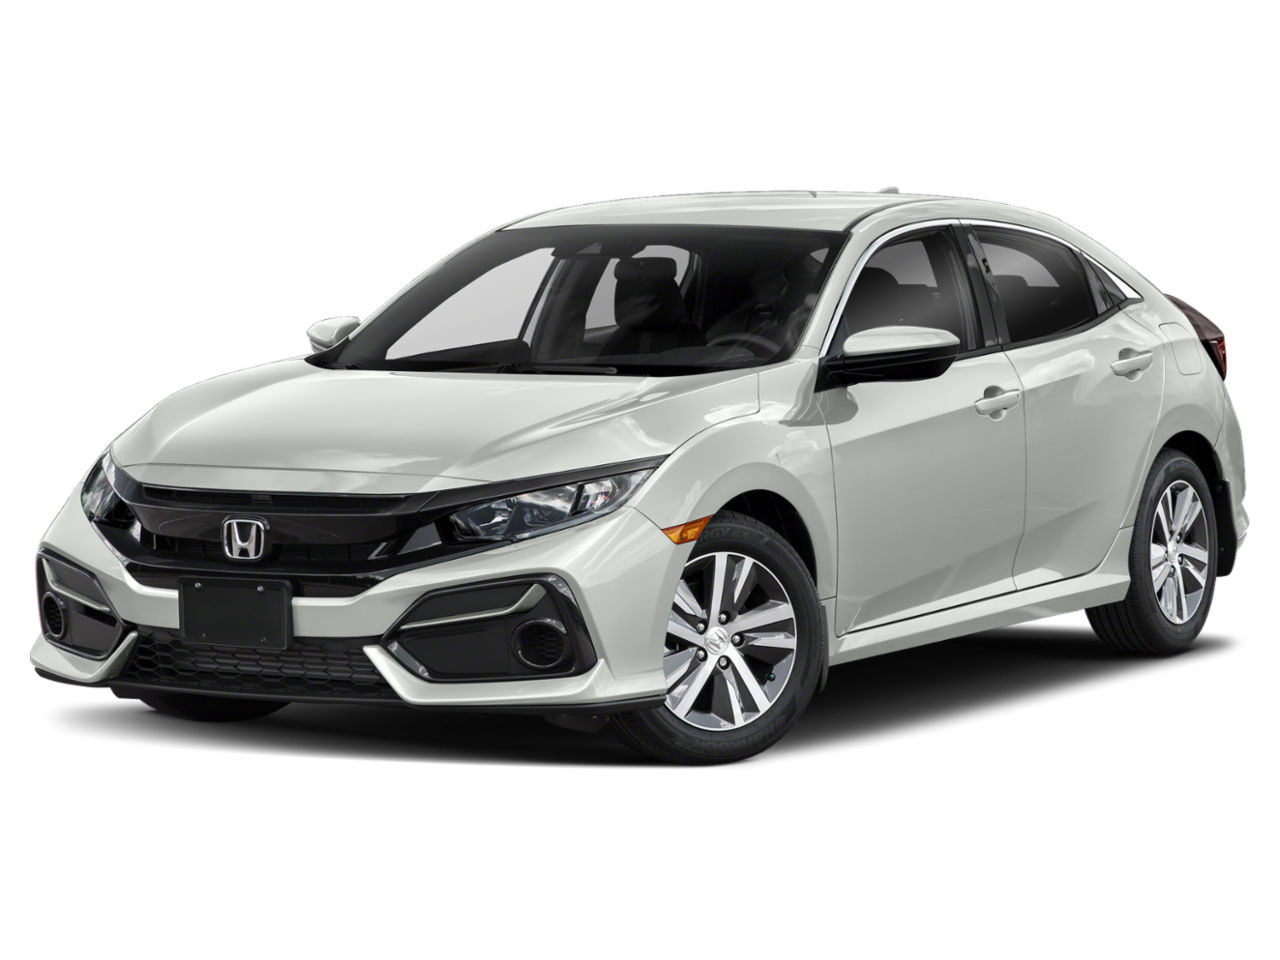 Honda 2020 Civic Hatchback LX